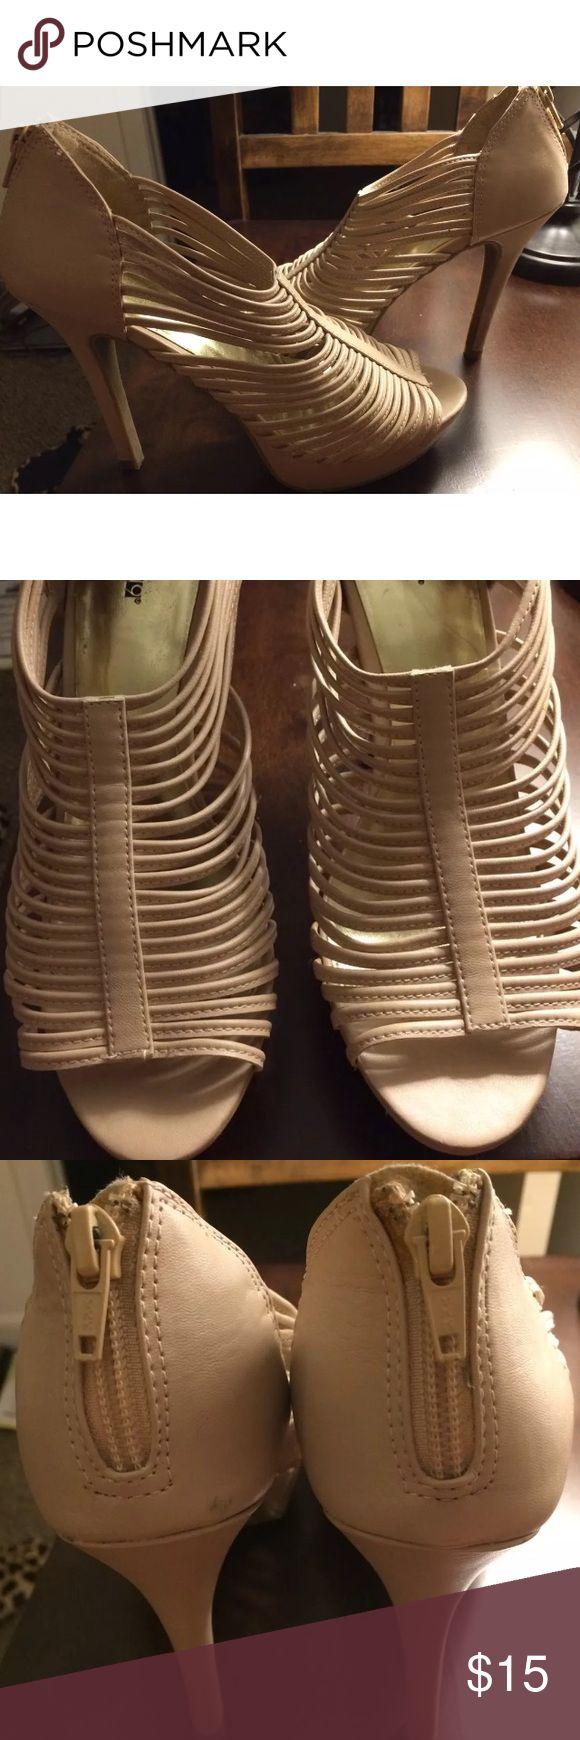 "Apt.9 Open Toe Stiletto Heels- Blush -size 7.5 Women's Apt. 9 platform/stiletto heels. Size 7.5. Light pink/nude/blush color. Peep toe with open weave. Zip up back. Rubber soles.  No original box.  Heel height is 5"" including platform. Apt. 9 Shoes Heels"